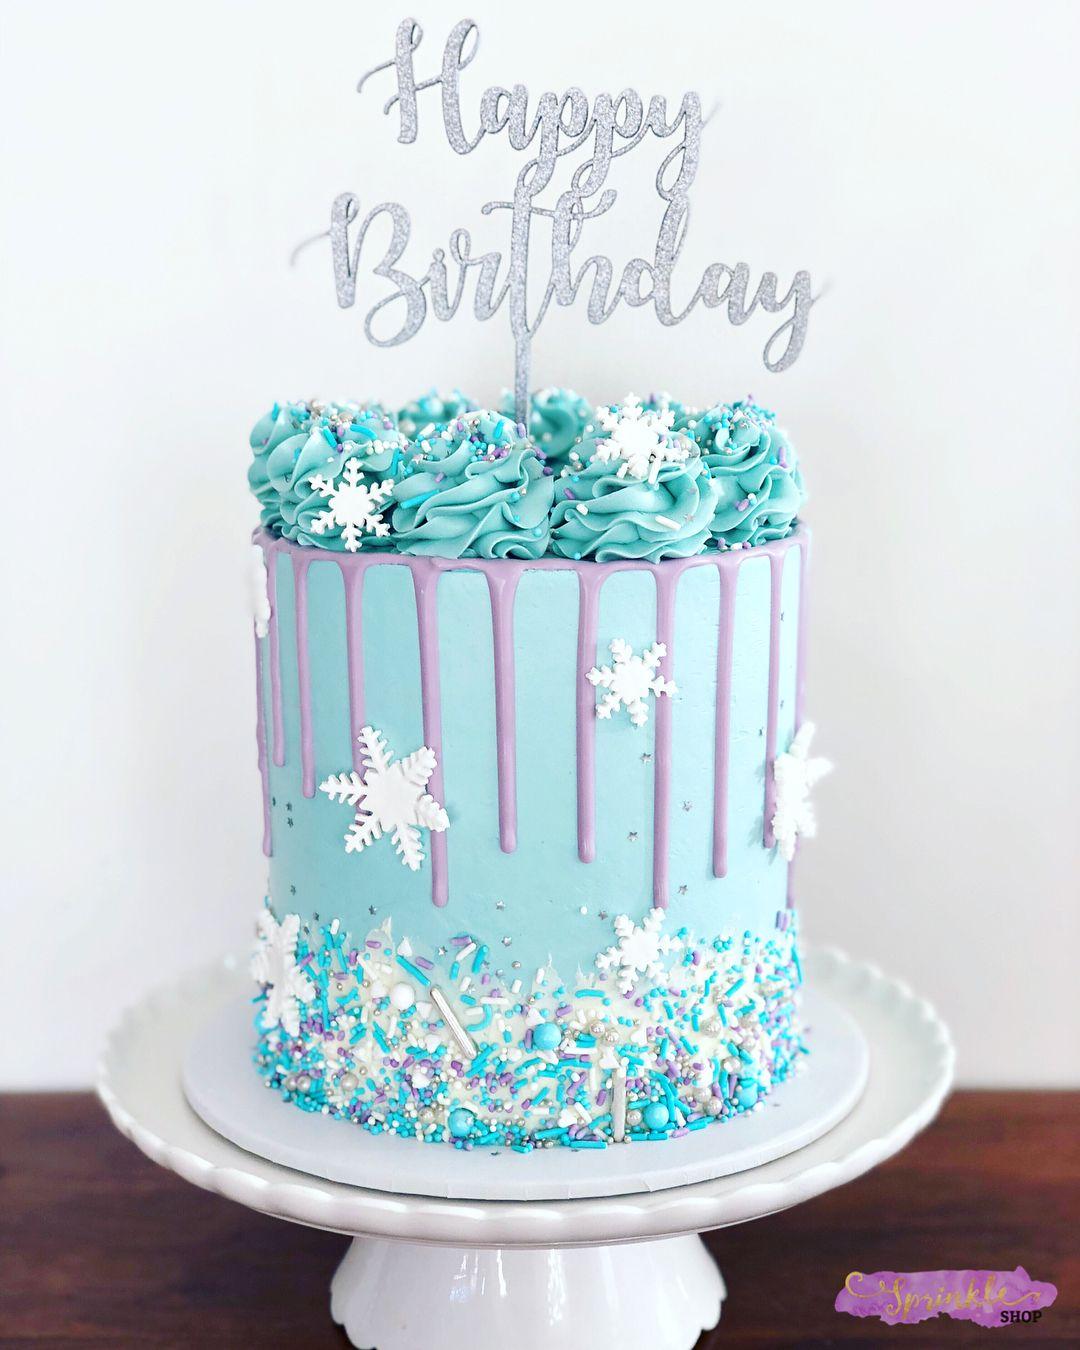 Frozen Buttercream Cake From Sprinkle Shop Sprinkle Shop